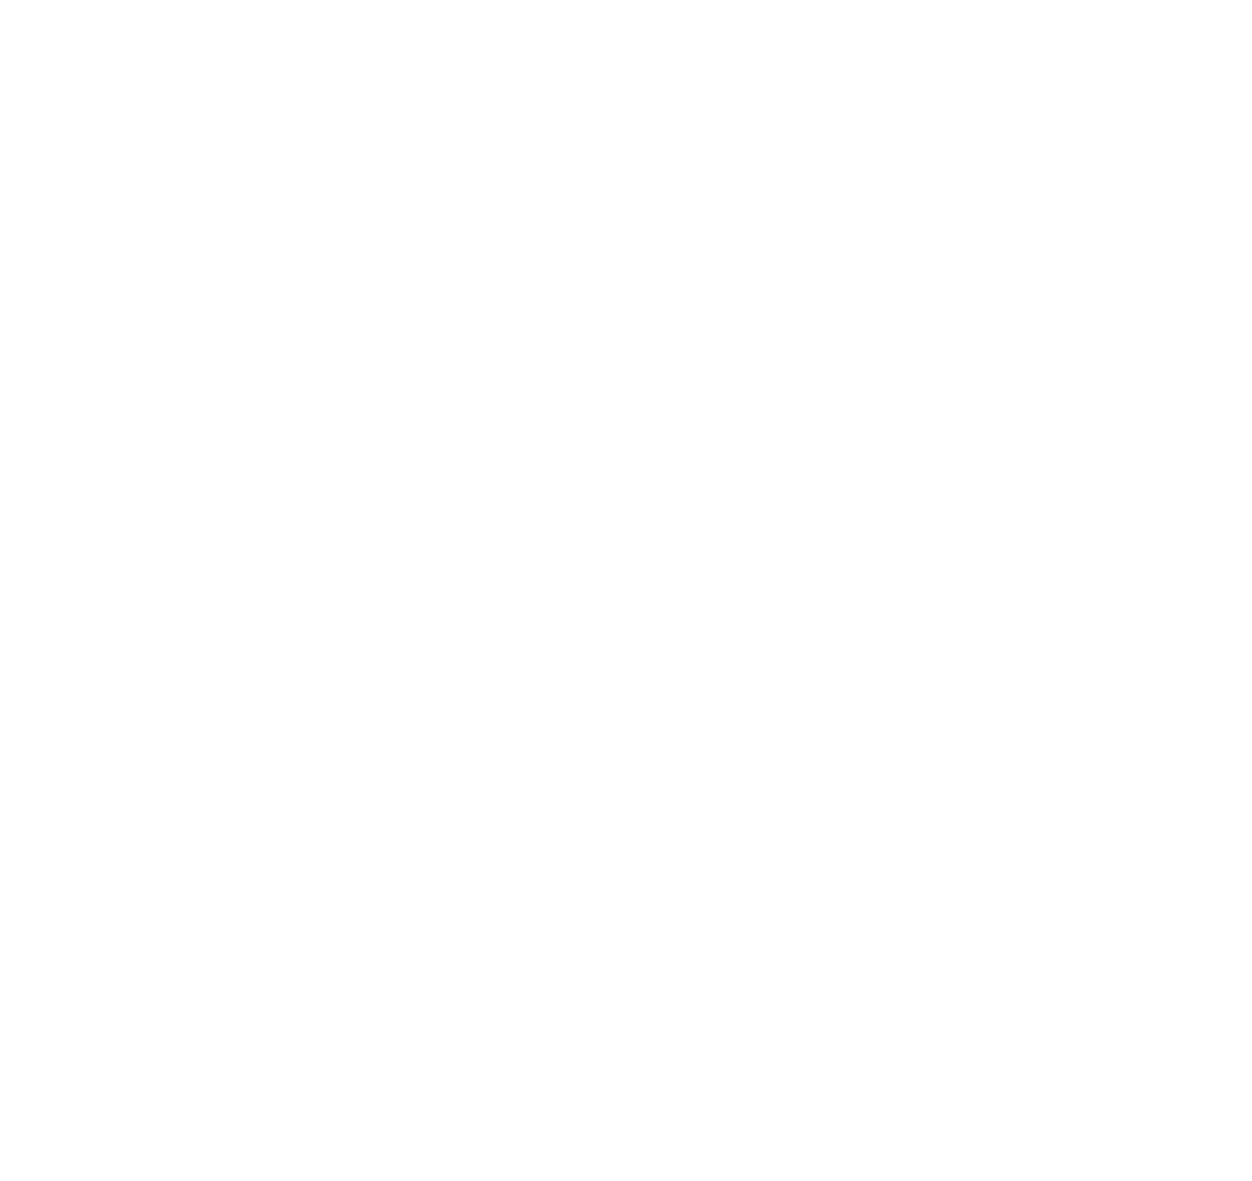 TGDM Logo (White)